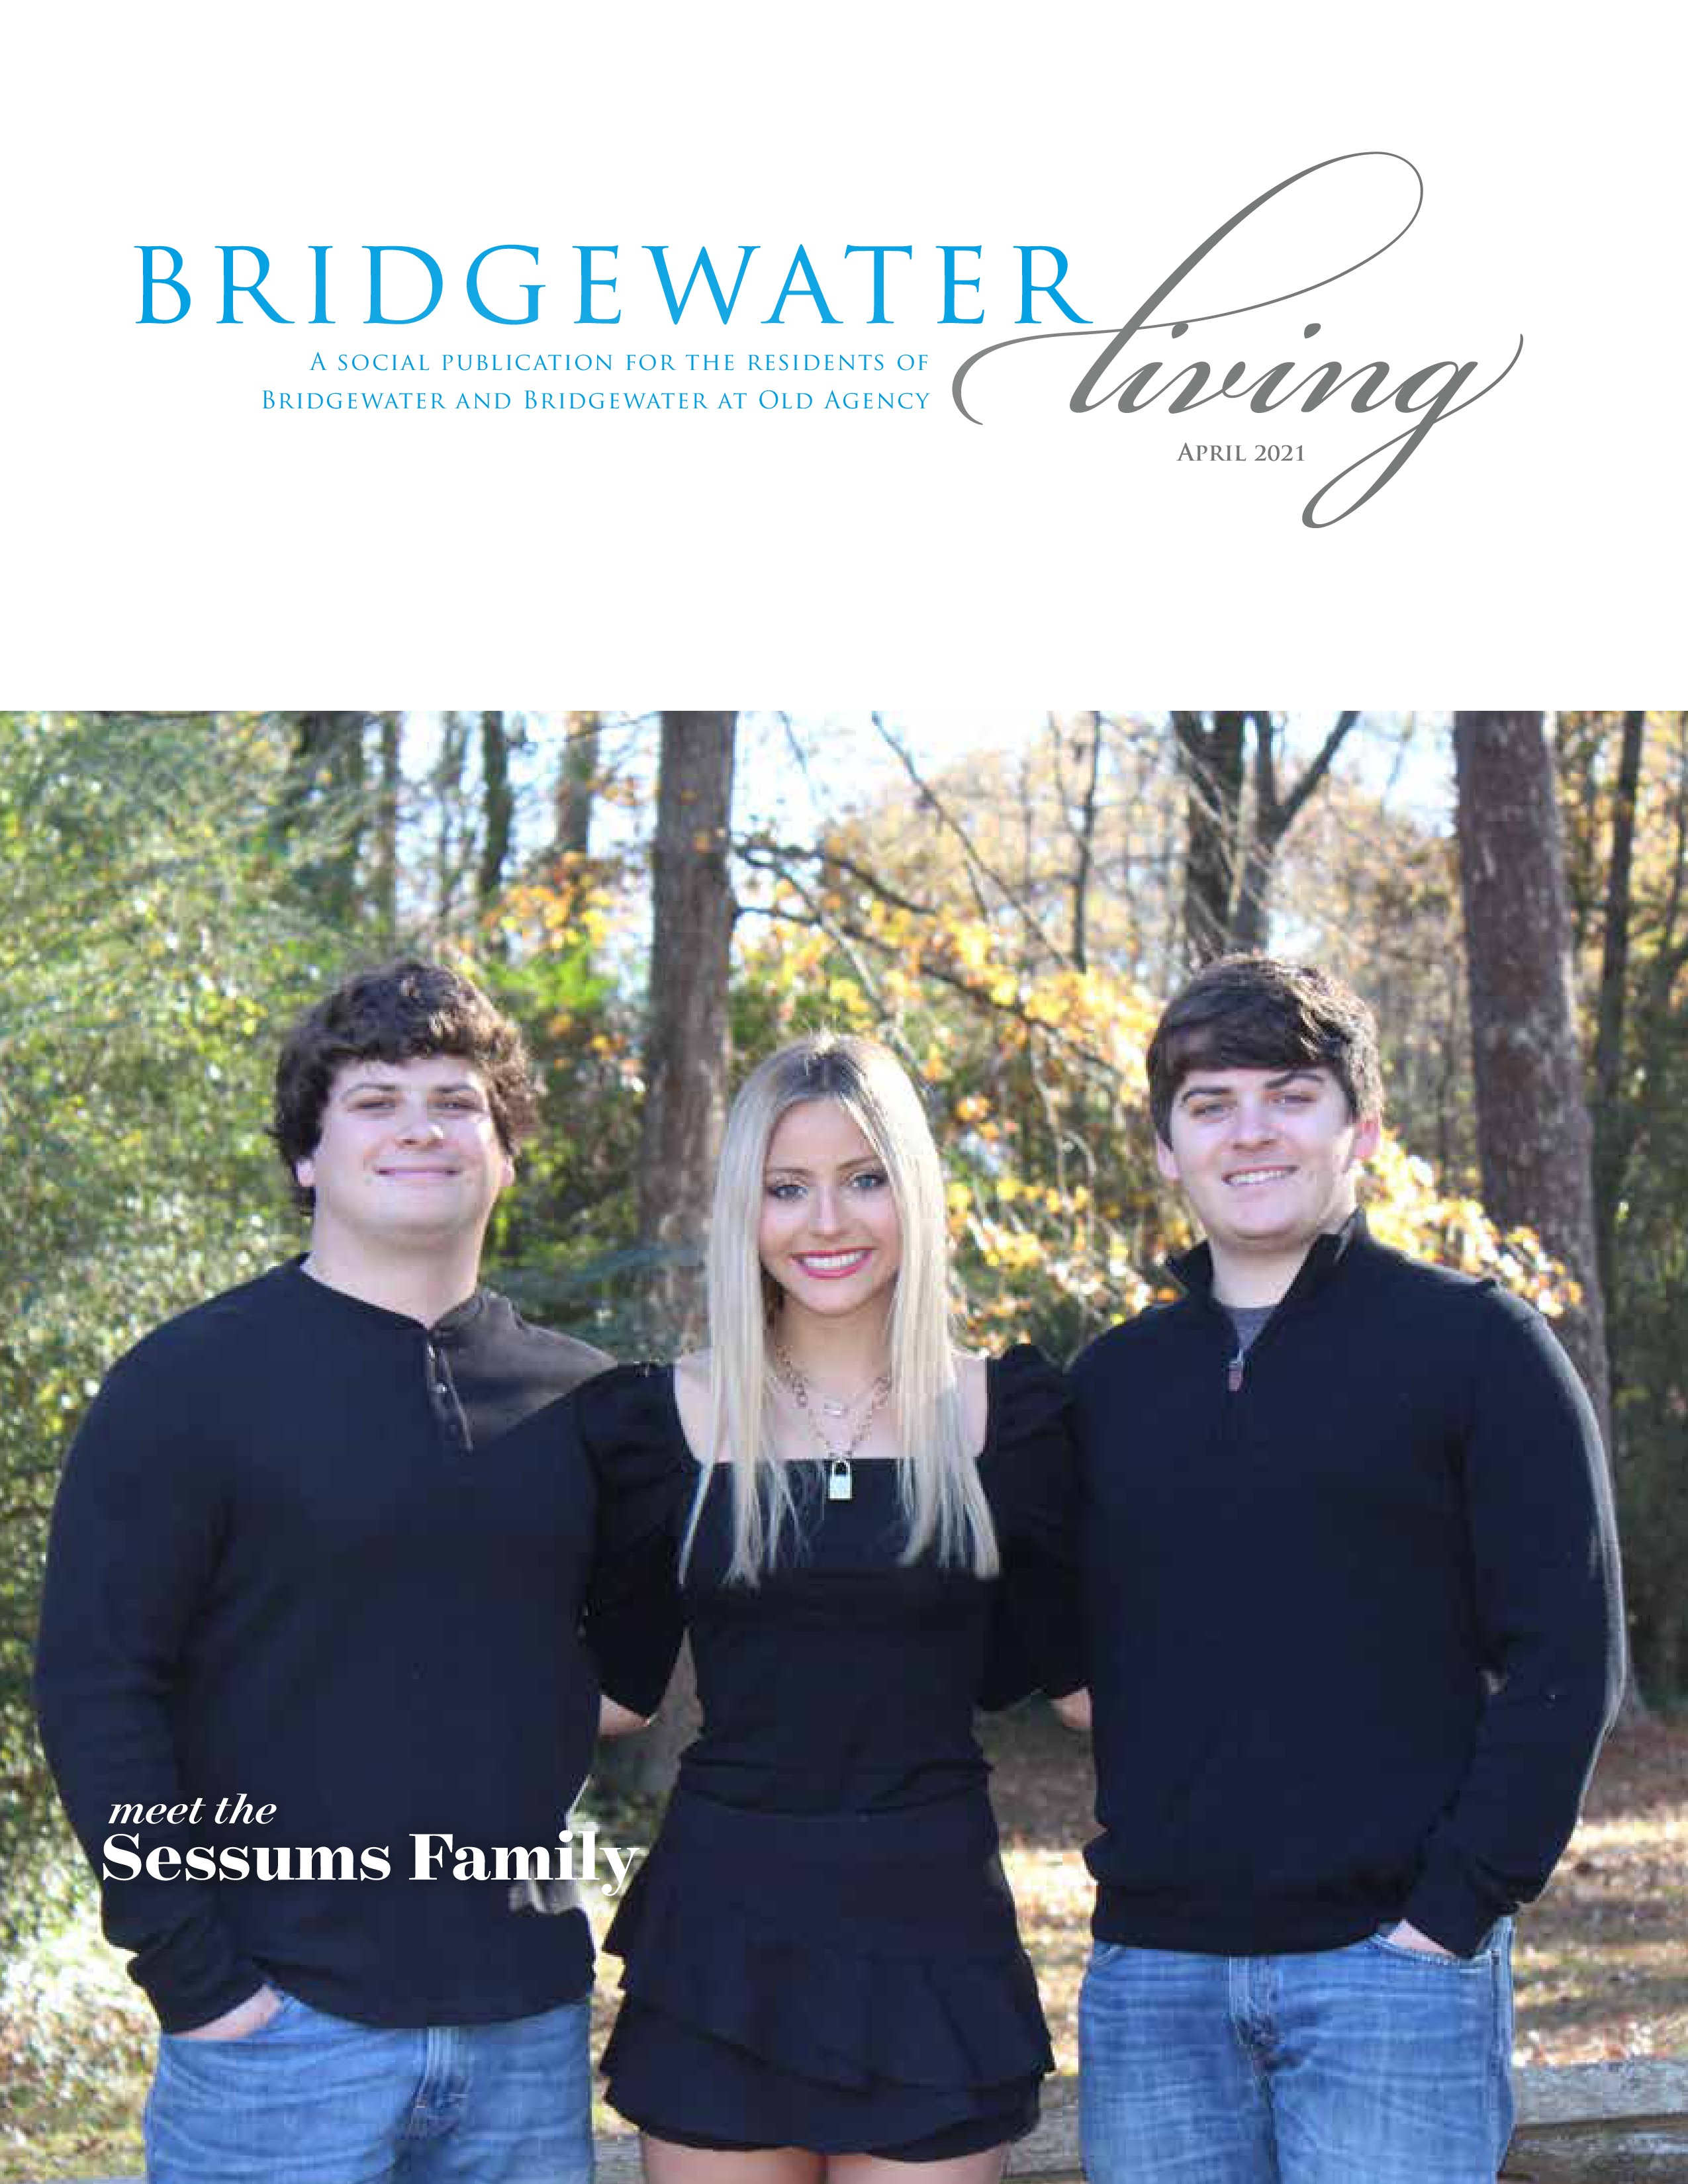 Bridgewater Living 2021-04-01